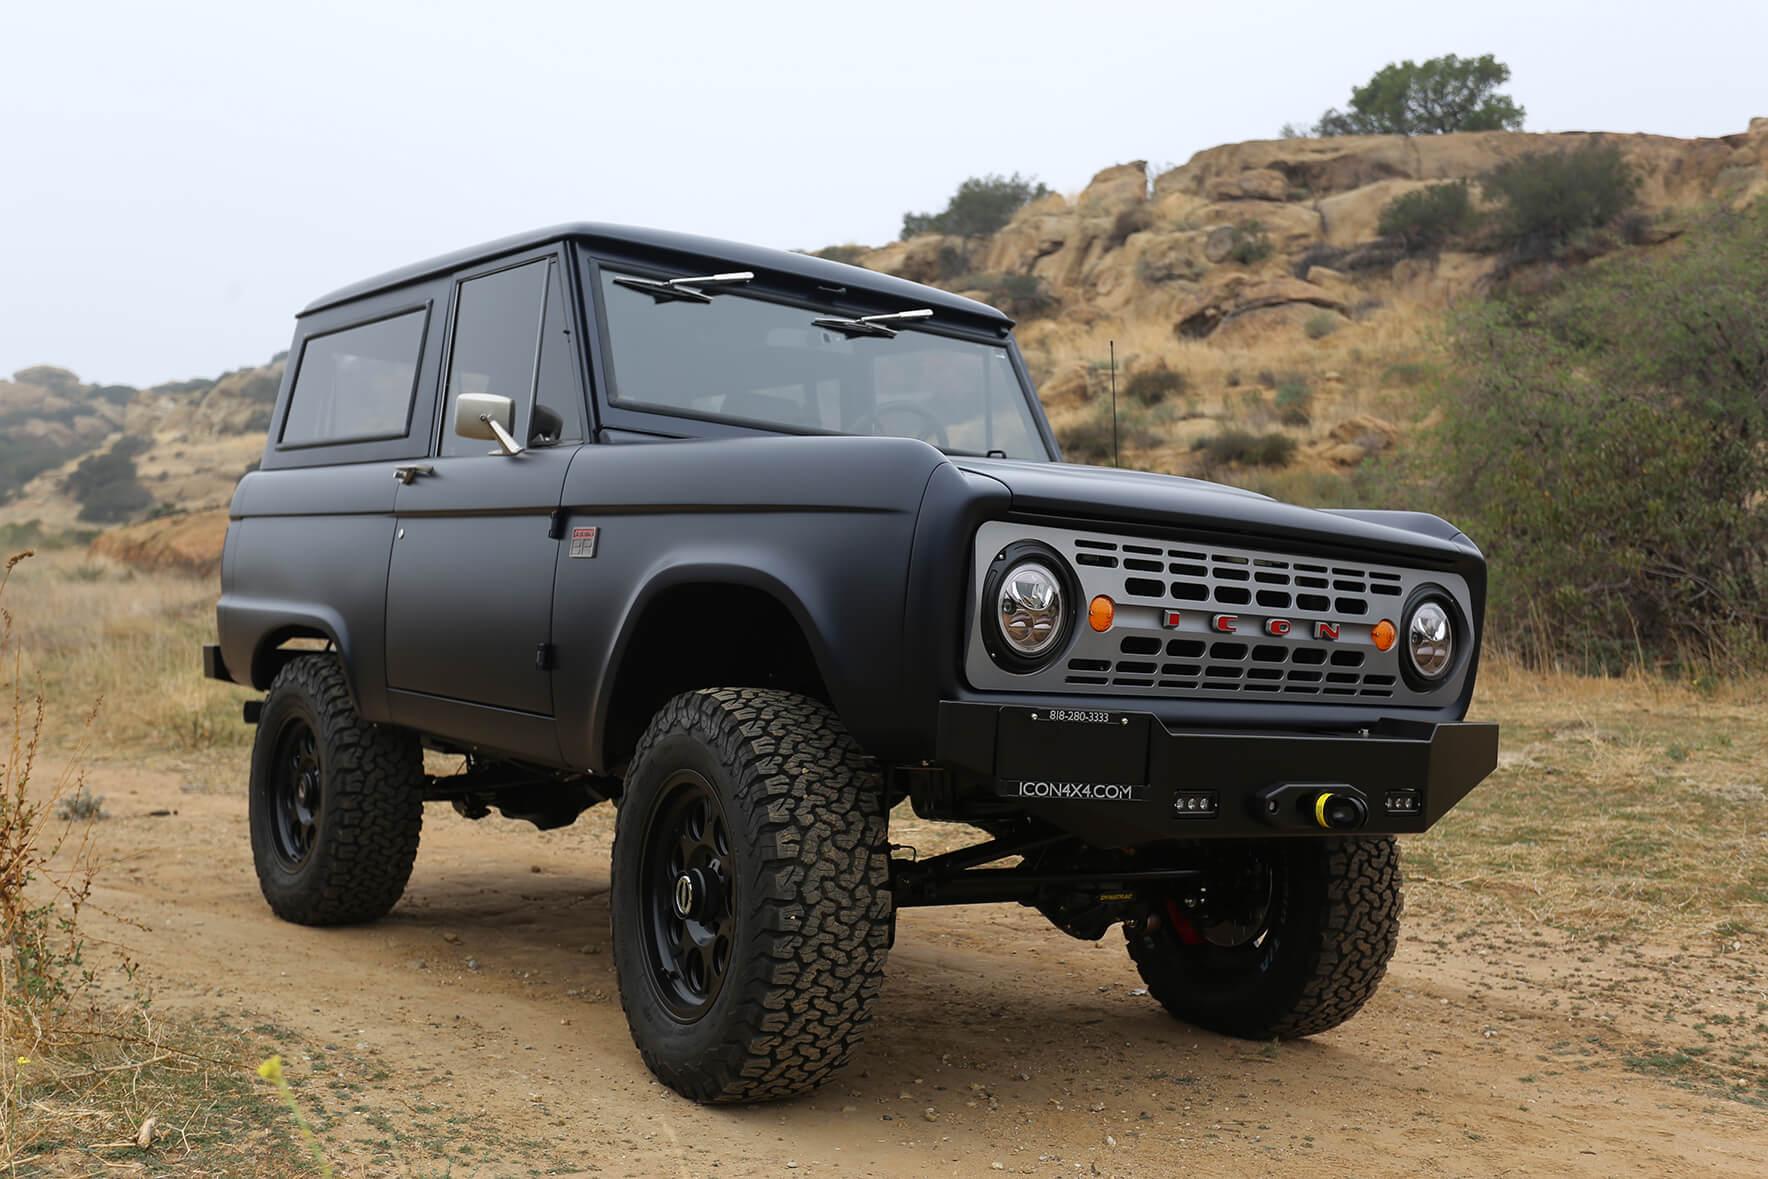 Ford Bronco Icon4x4 Icon BR